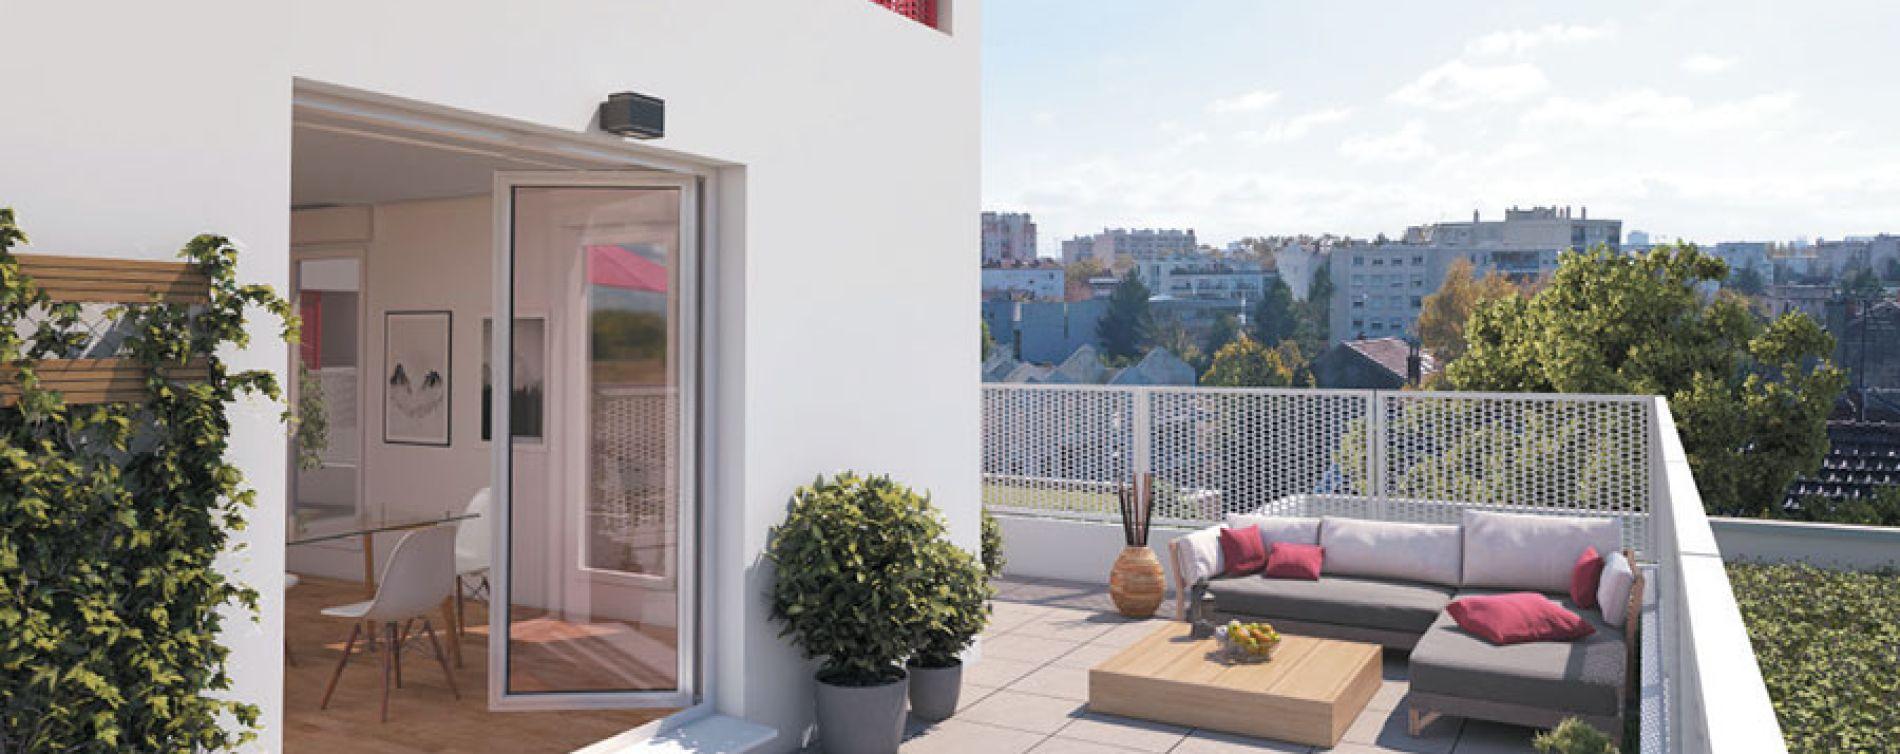 Villeurbanne : programme immobilier neuve « Octavie » (4)